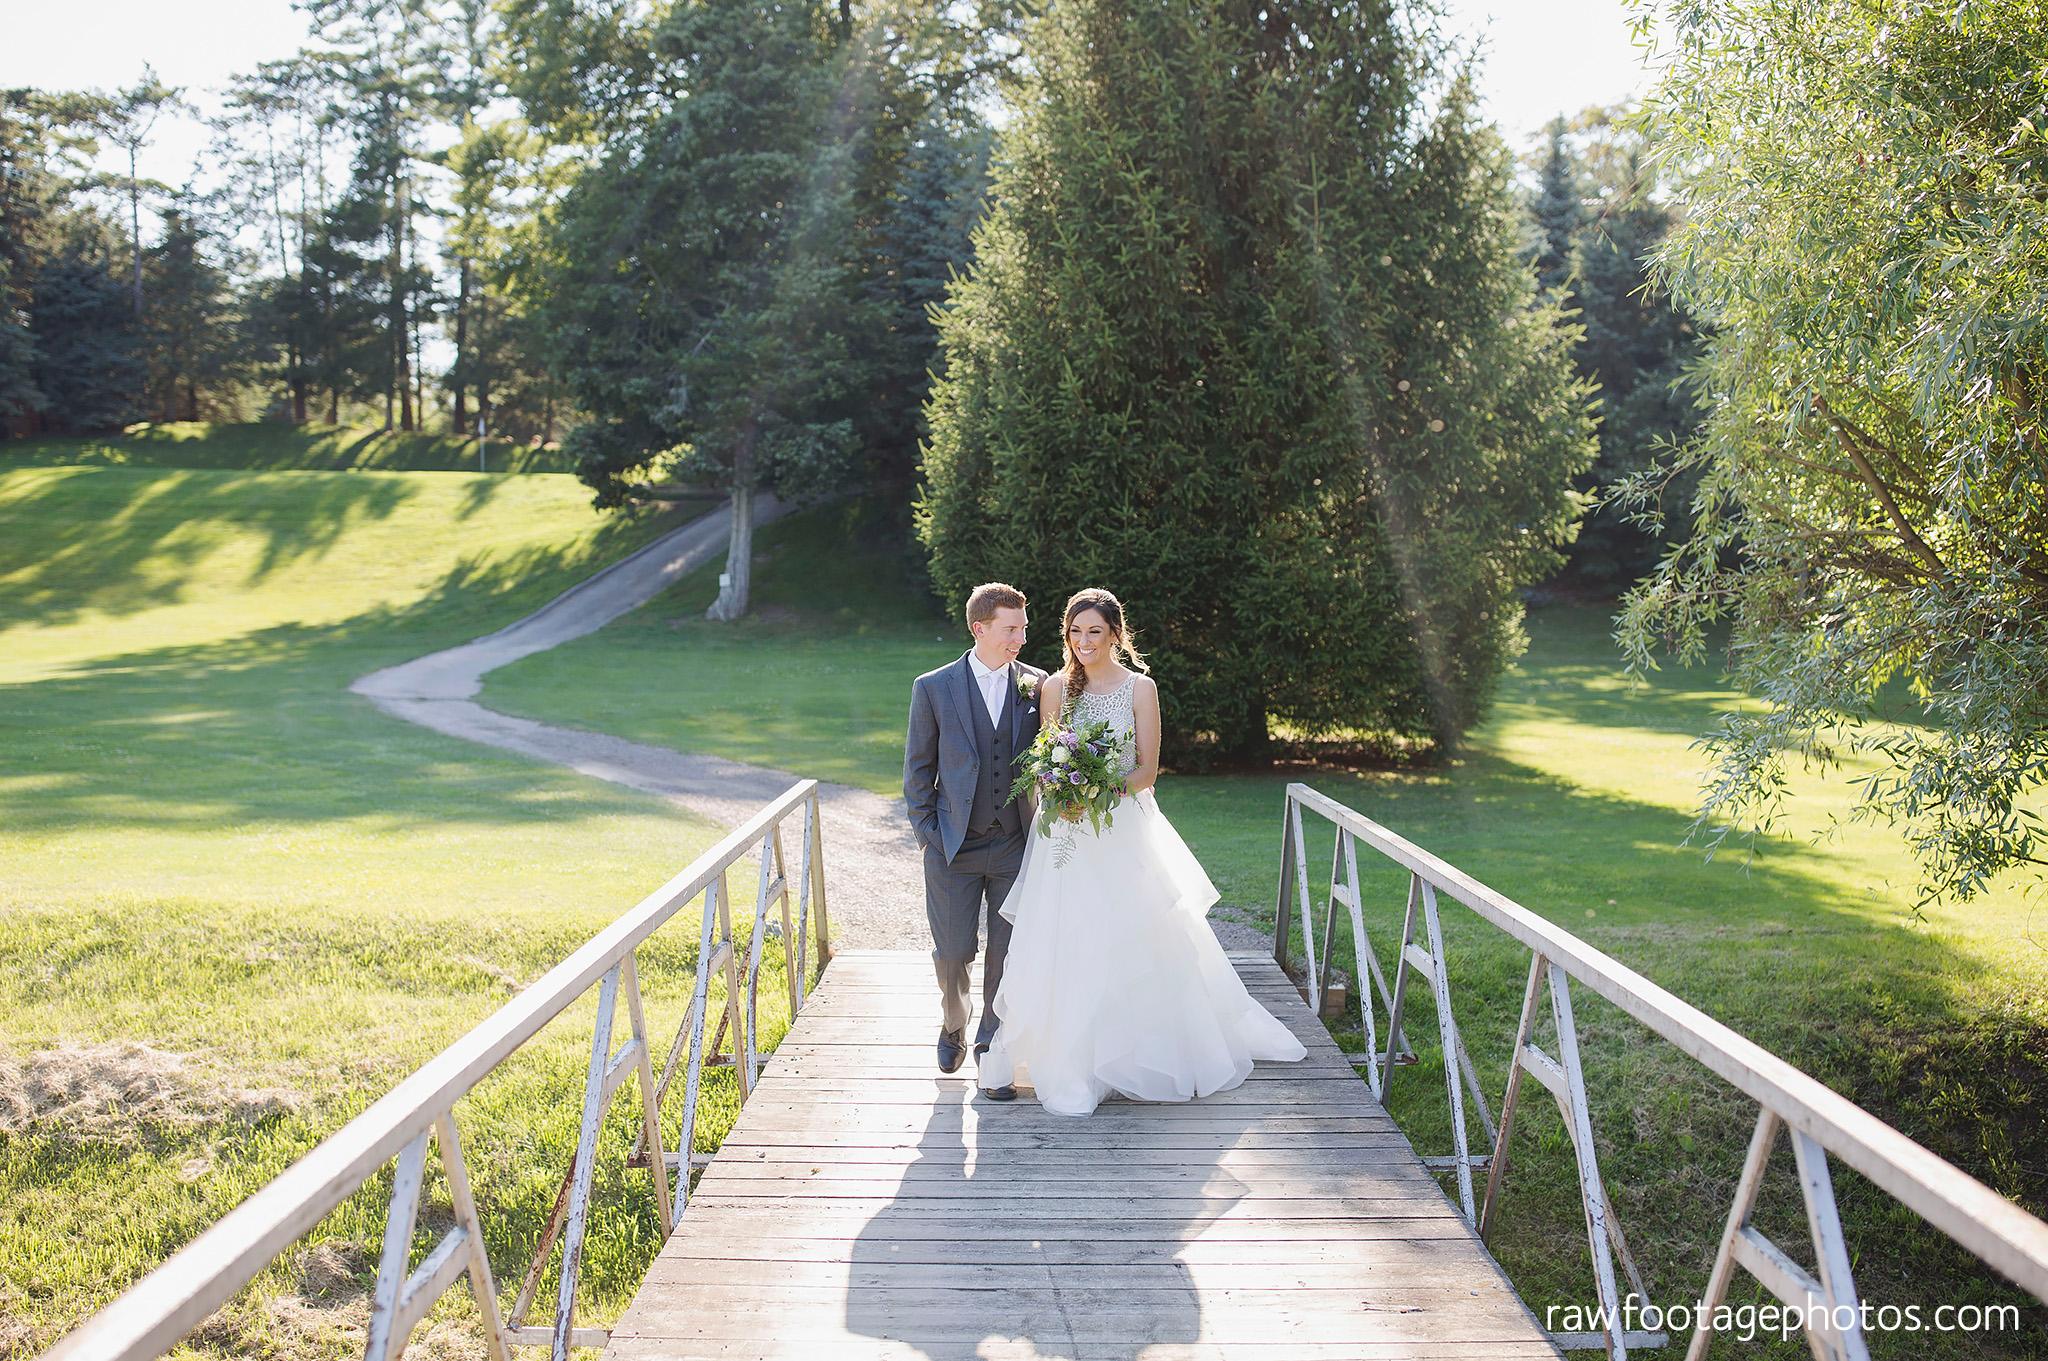 london_ontario_wedding_photographer-grand_bend_wedding_photographer-oakwood_resort_wedding-beach_wedding-sunset_wedding-raw_footage_photography044.jpg